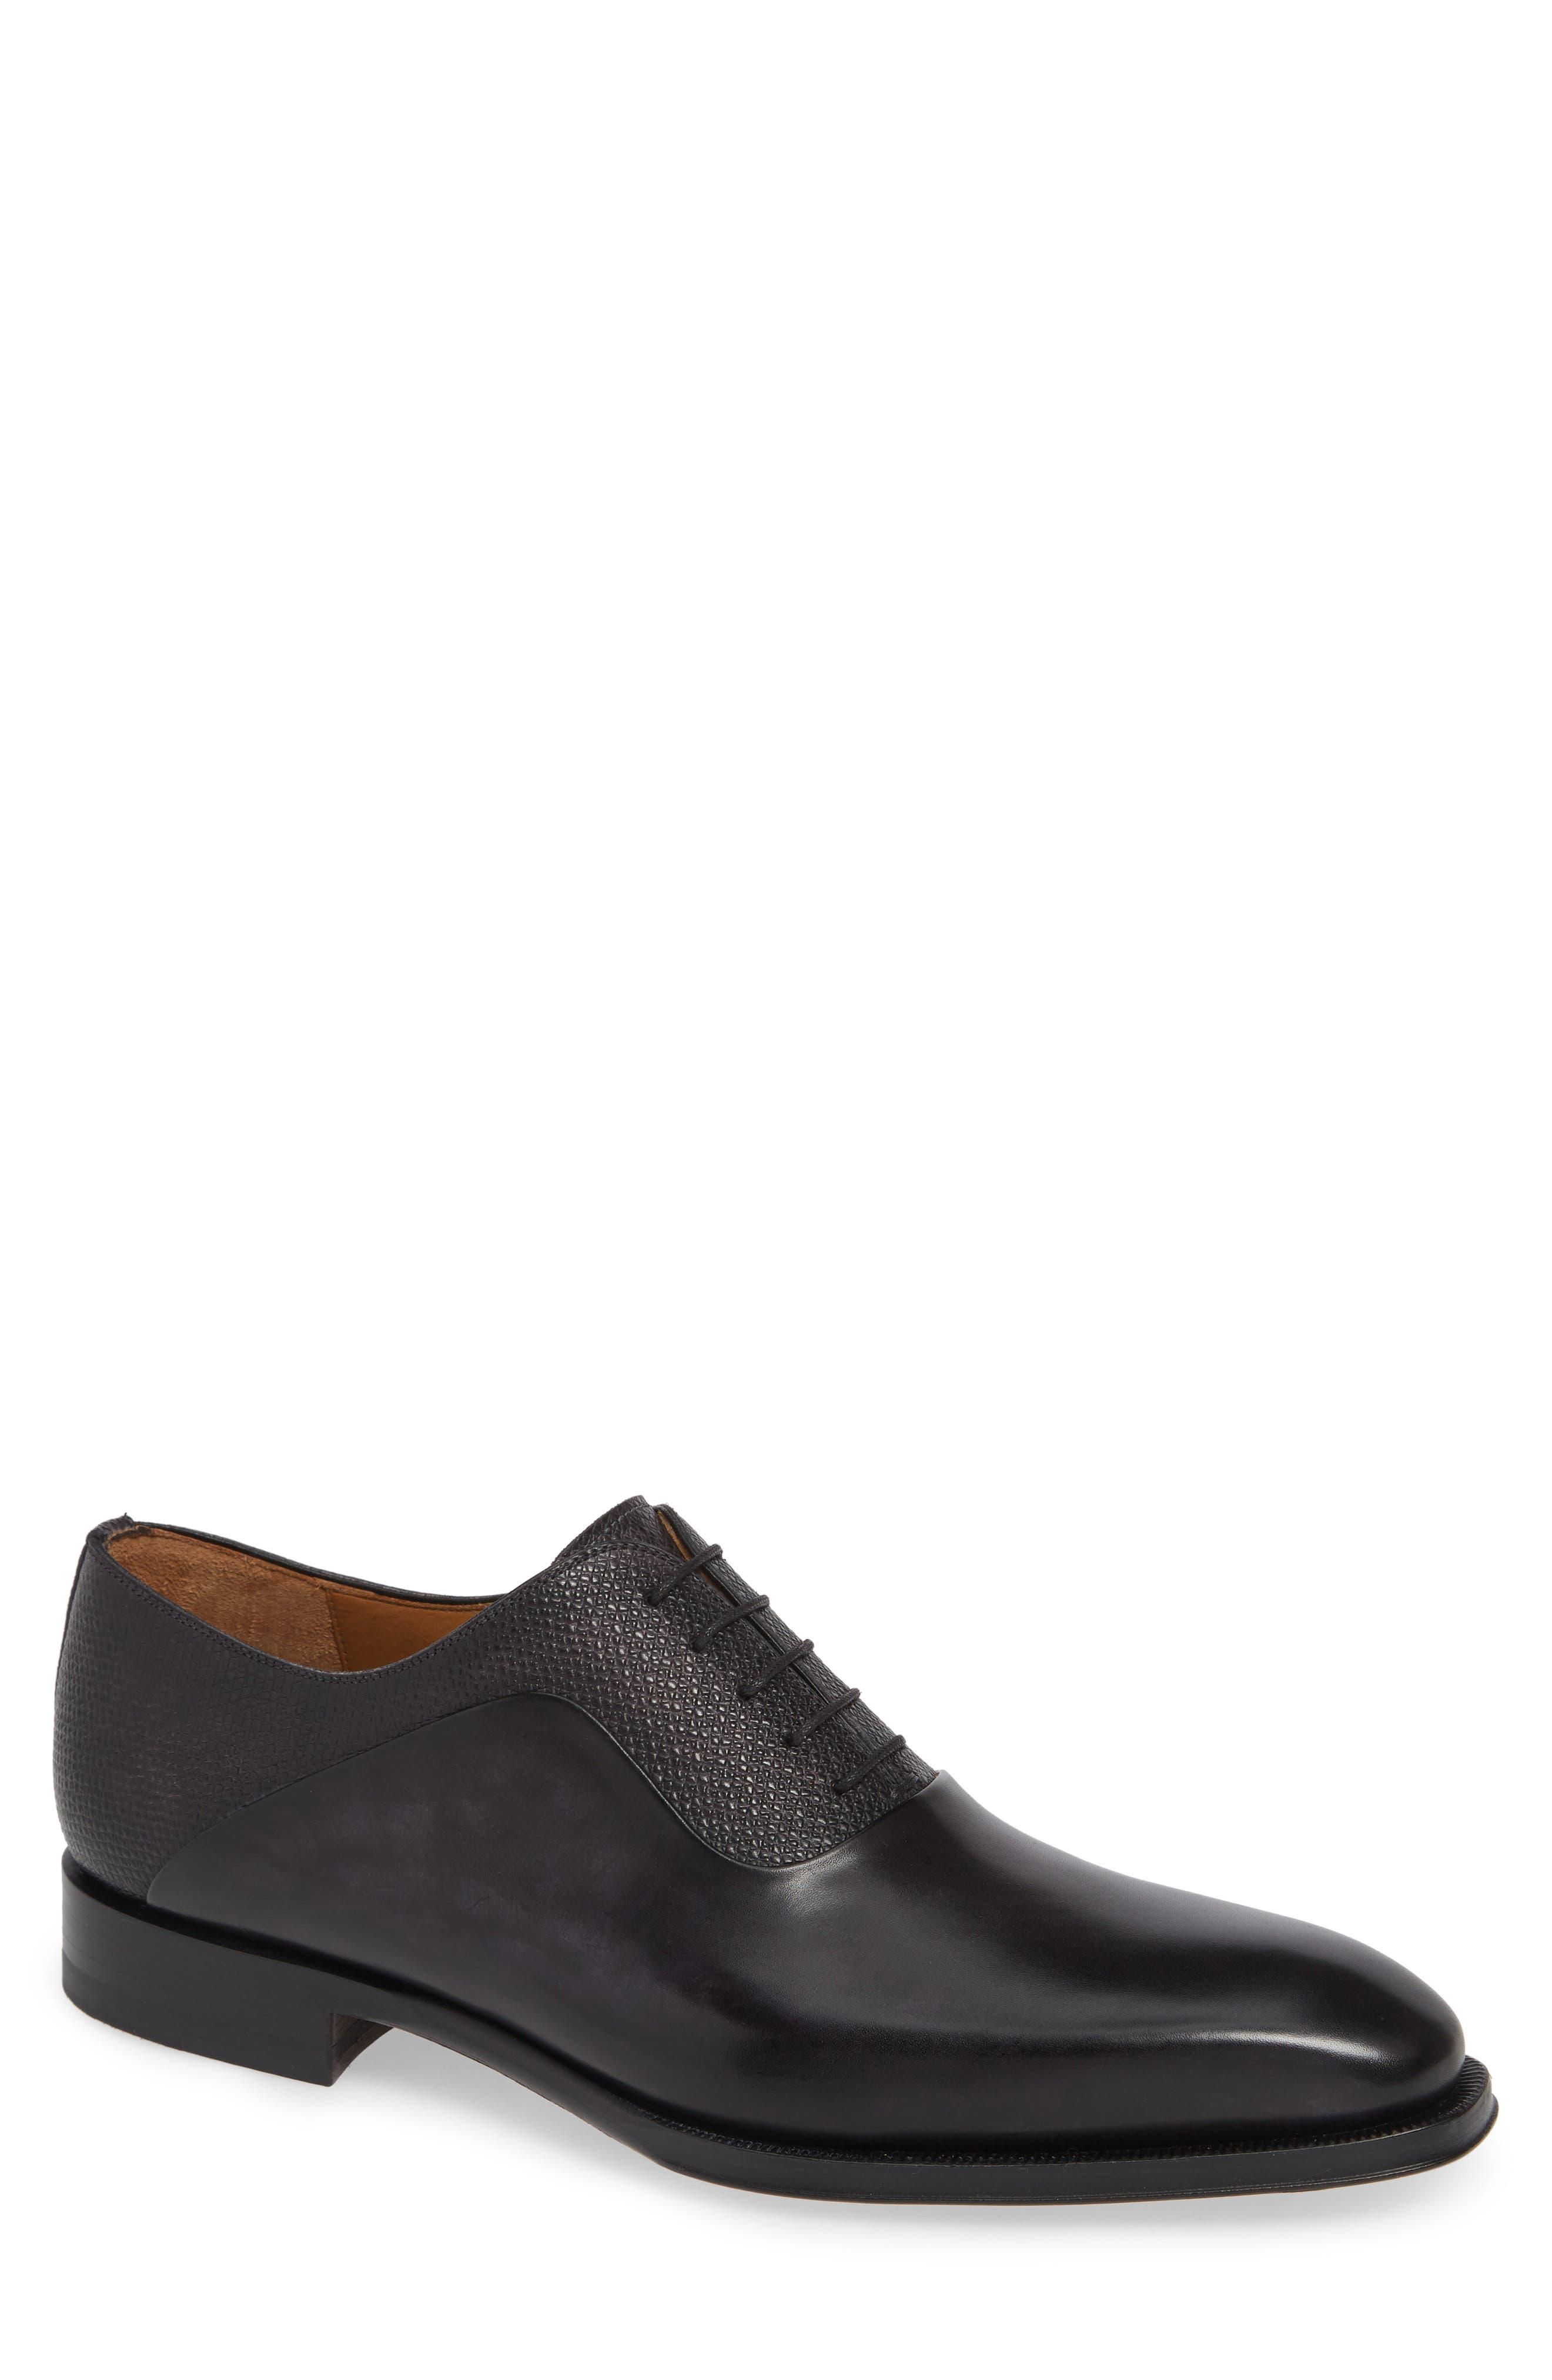 Hugh Plain Toe Oxford,                         Main,                         color, GREY LEATHER